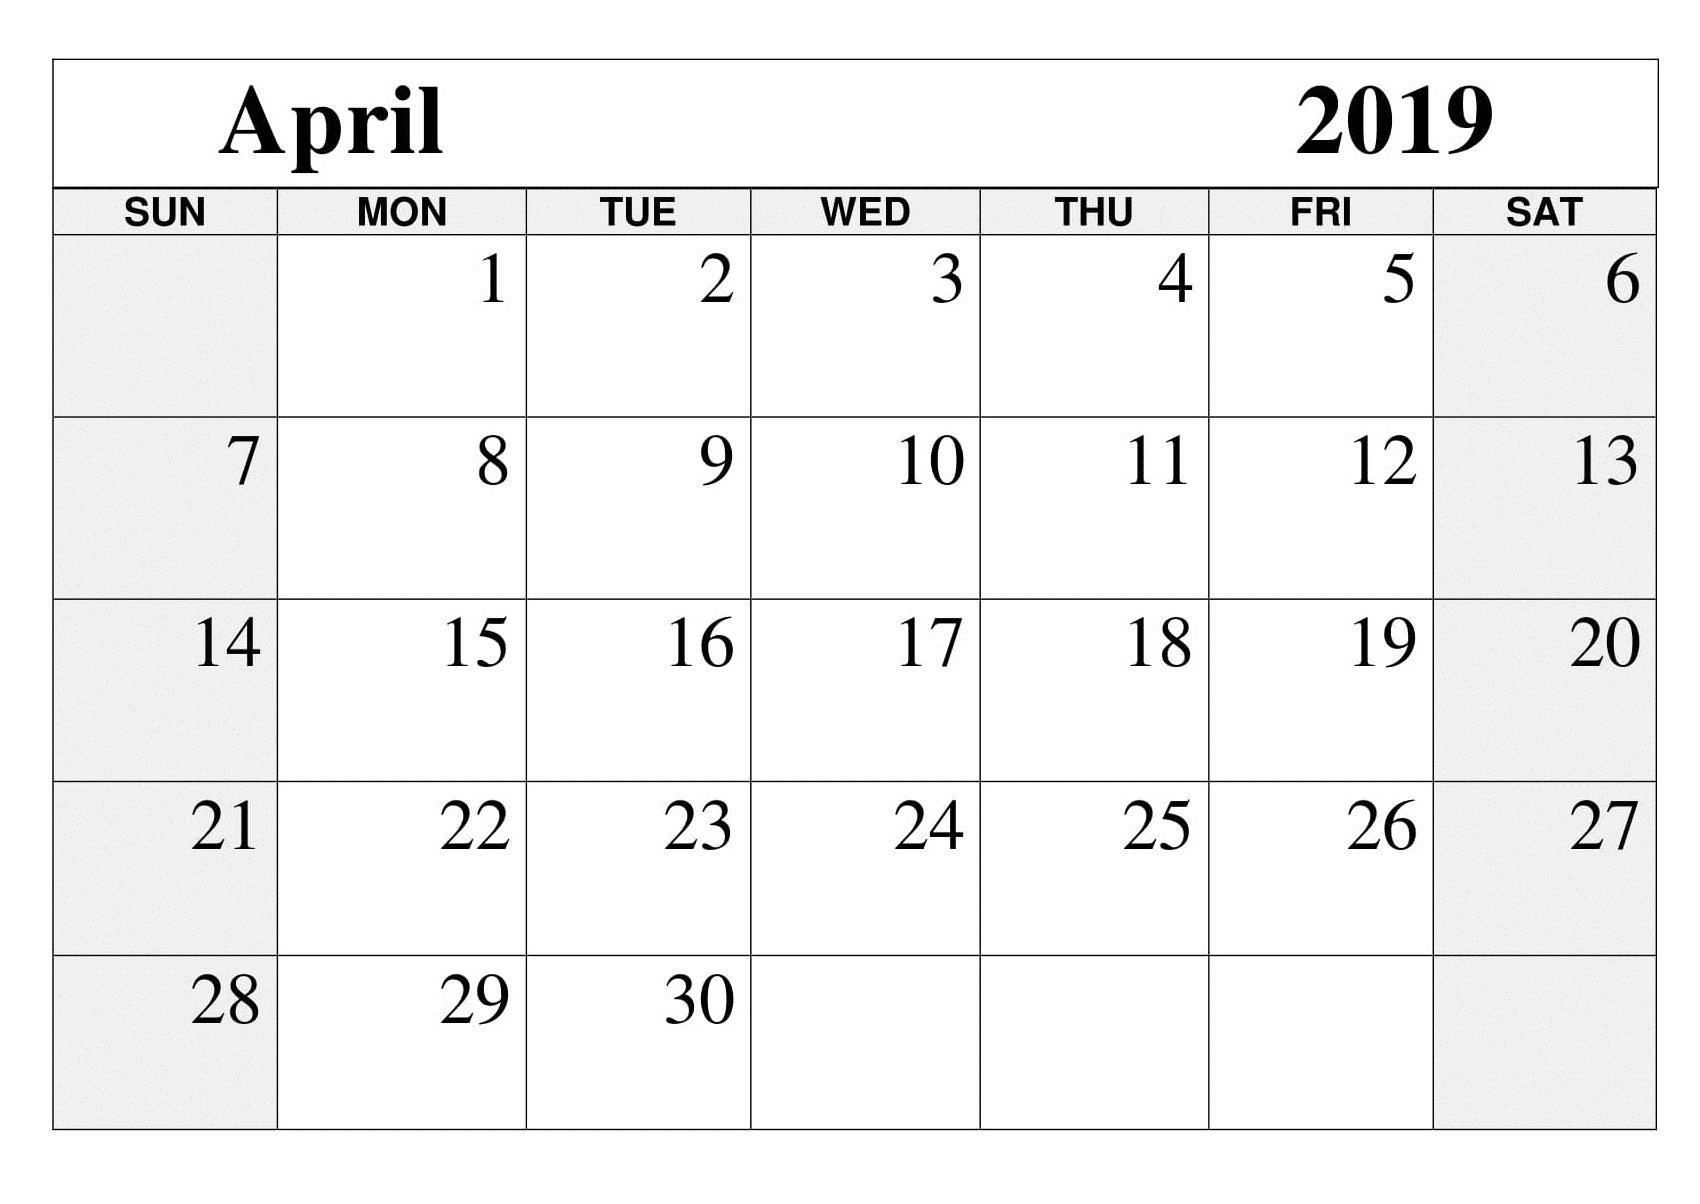 Printable April 2019 Calendar - Free March 2019 Calendar Printable April 5 2019 Calendar